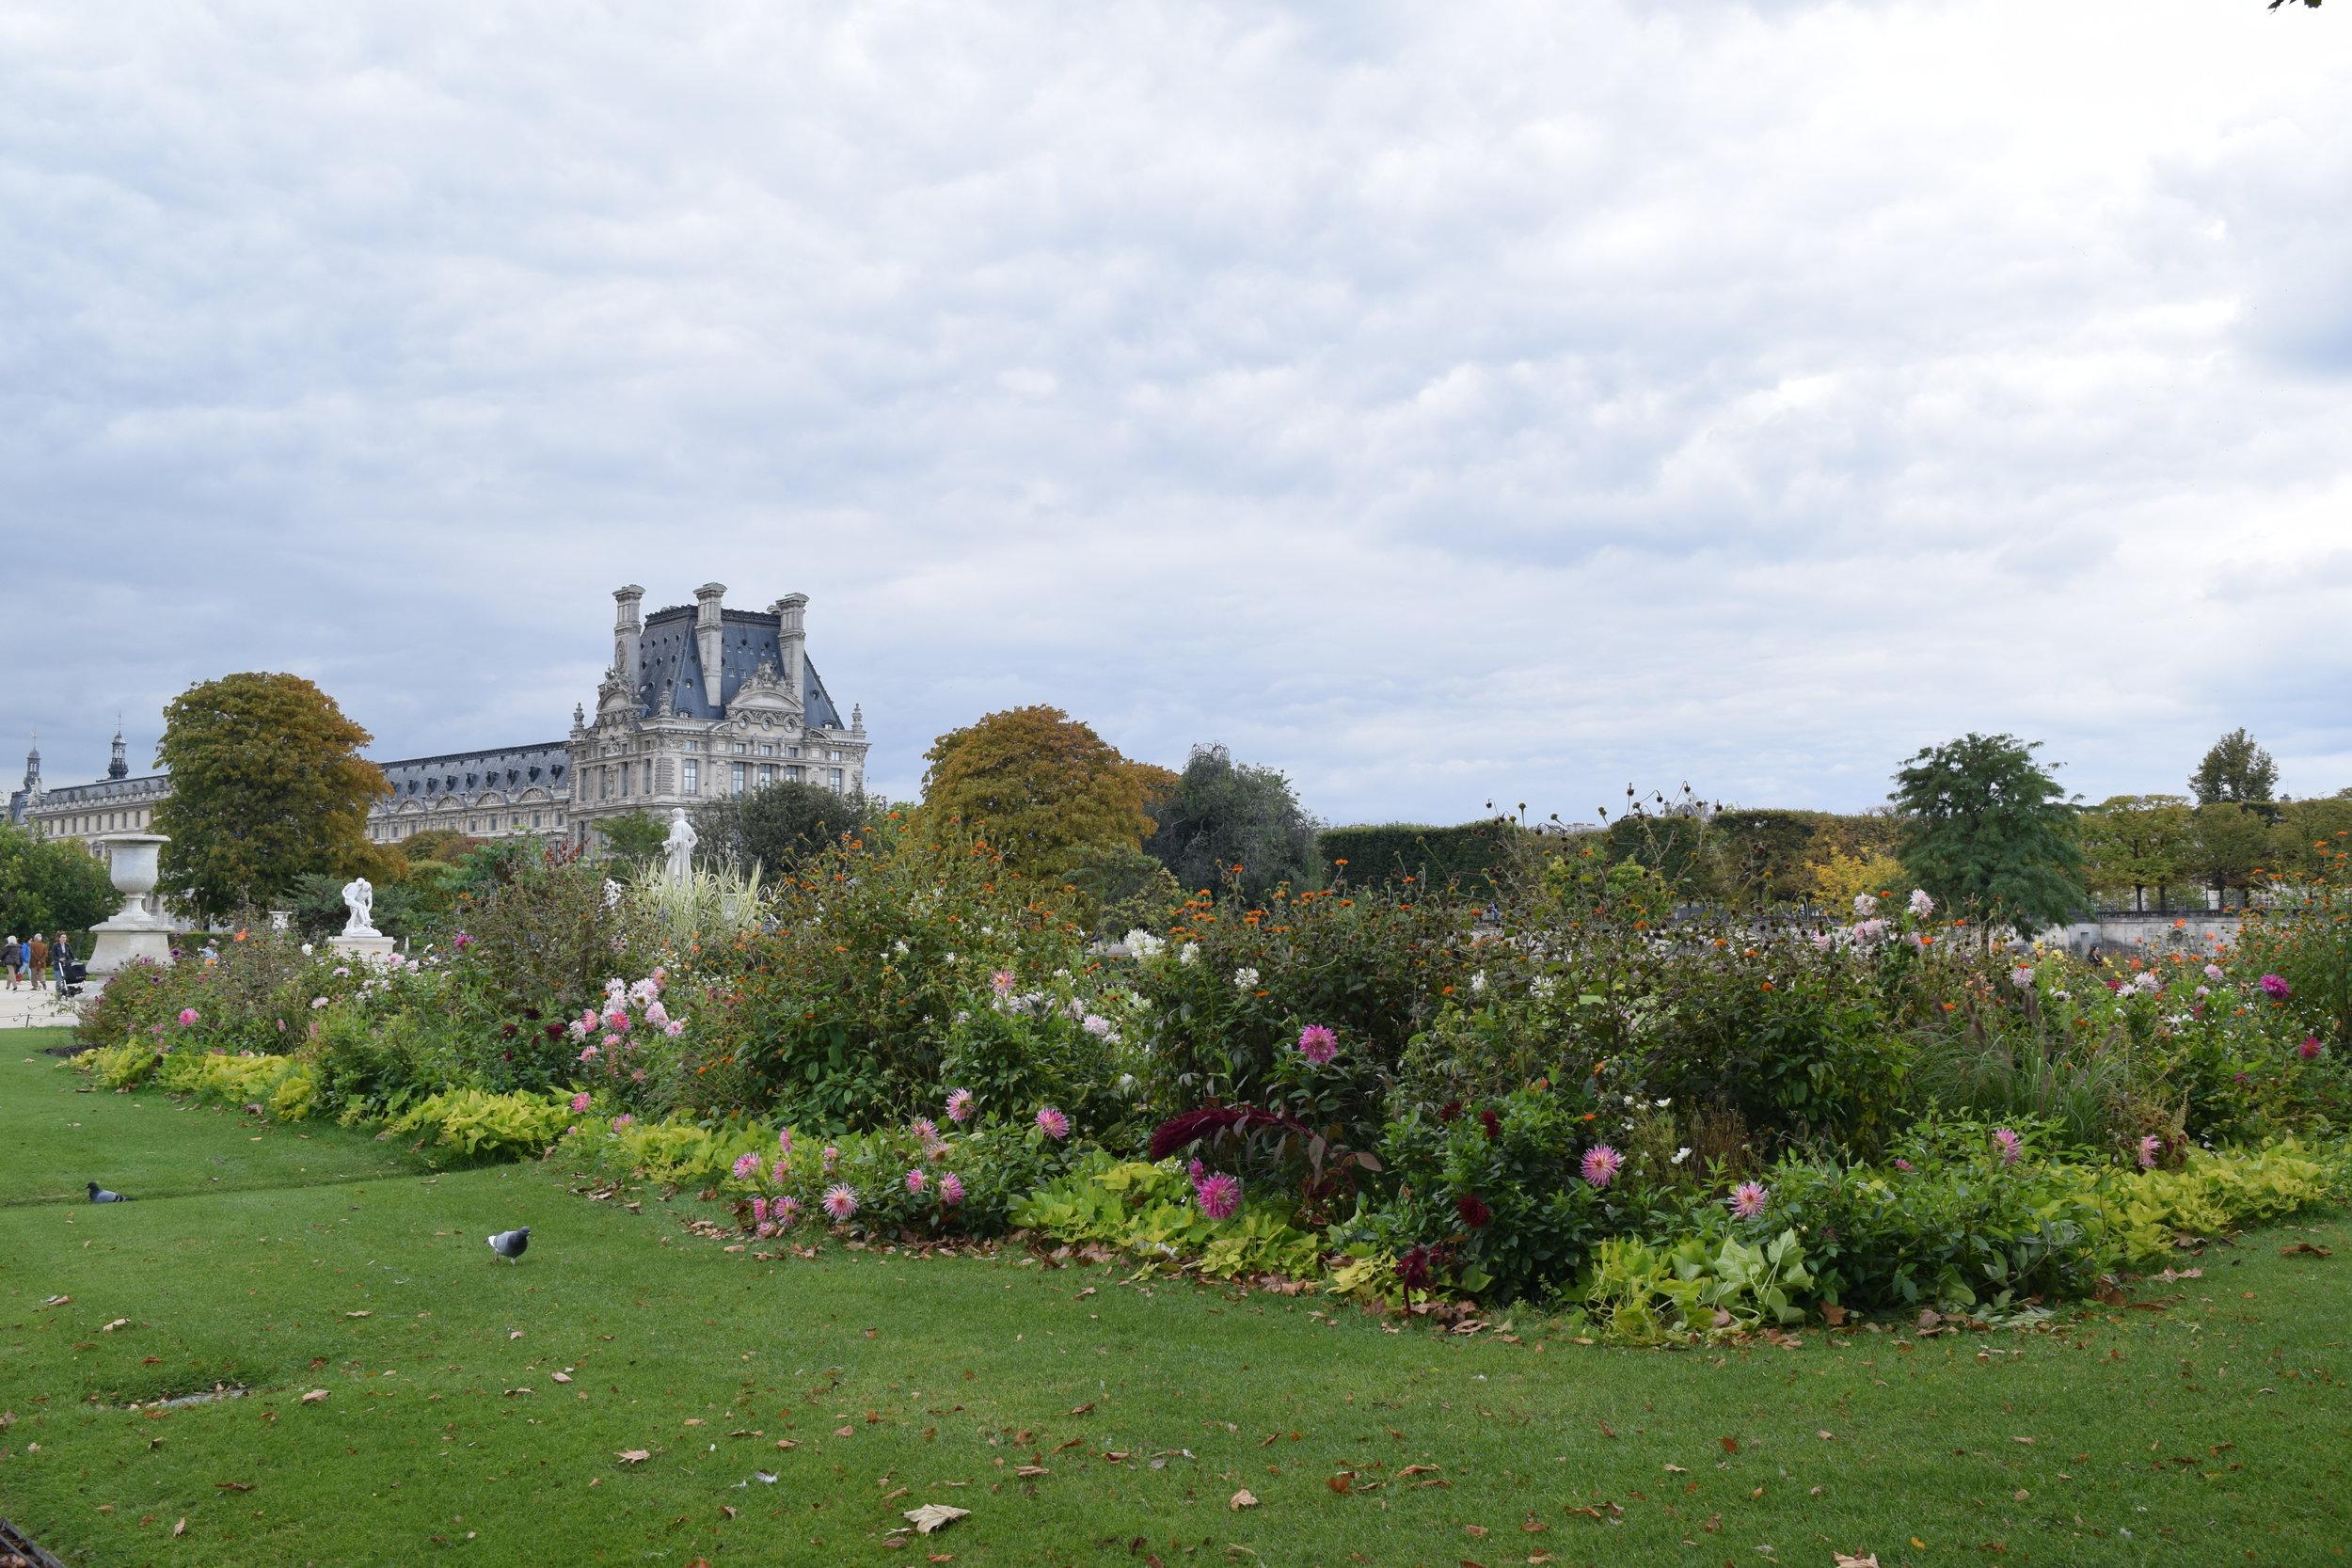 Relaxing in the Tuileries